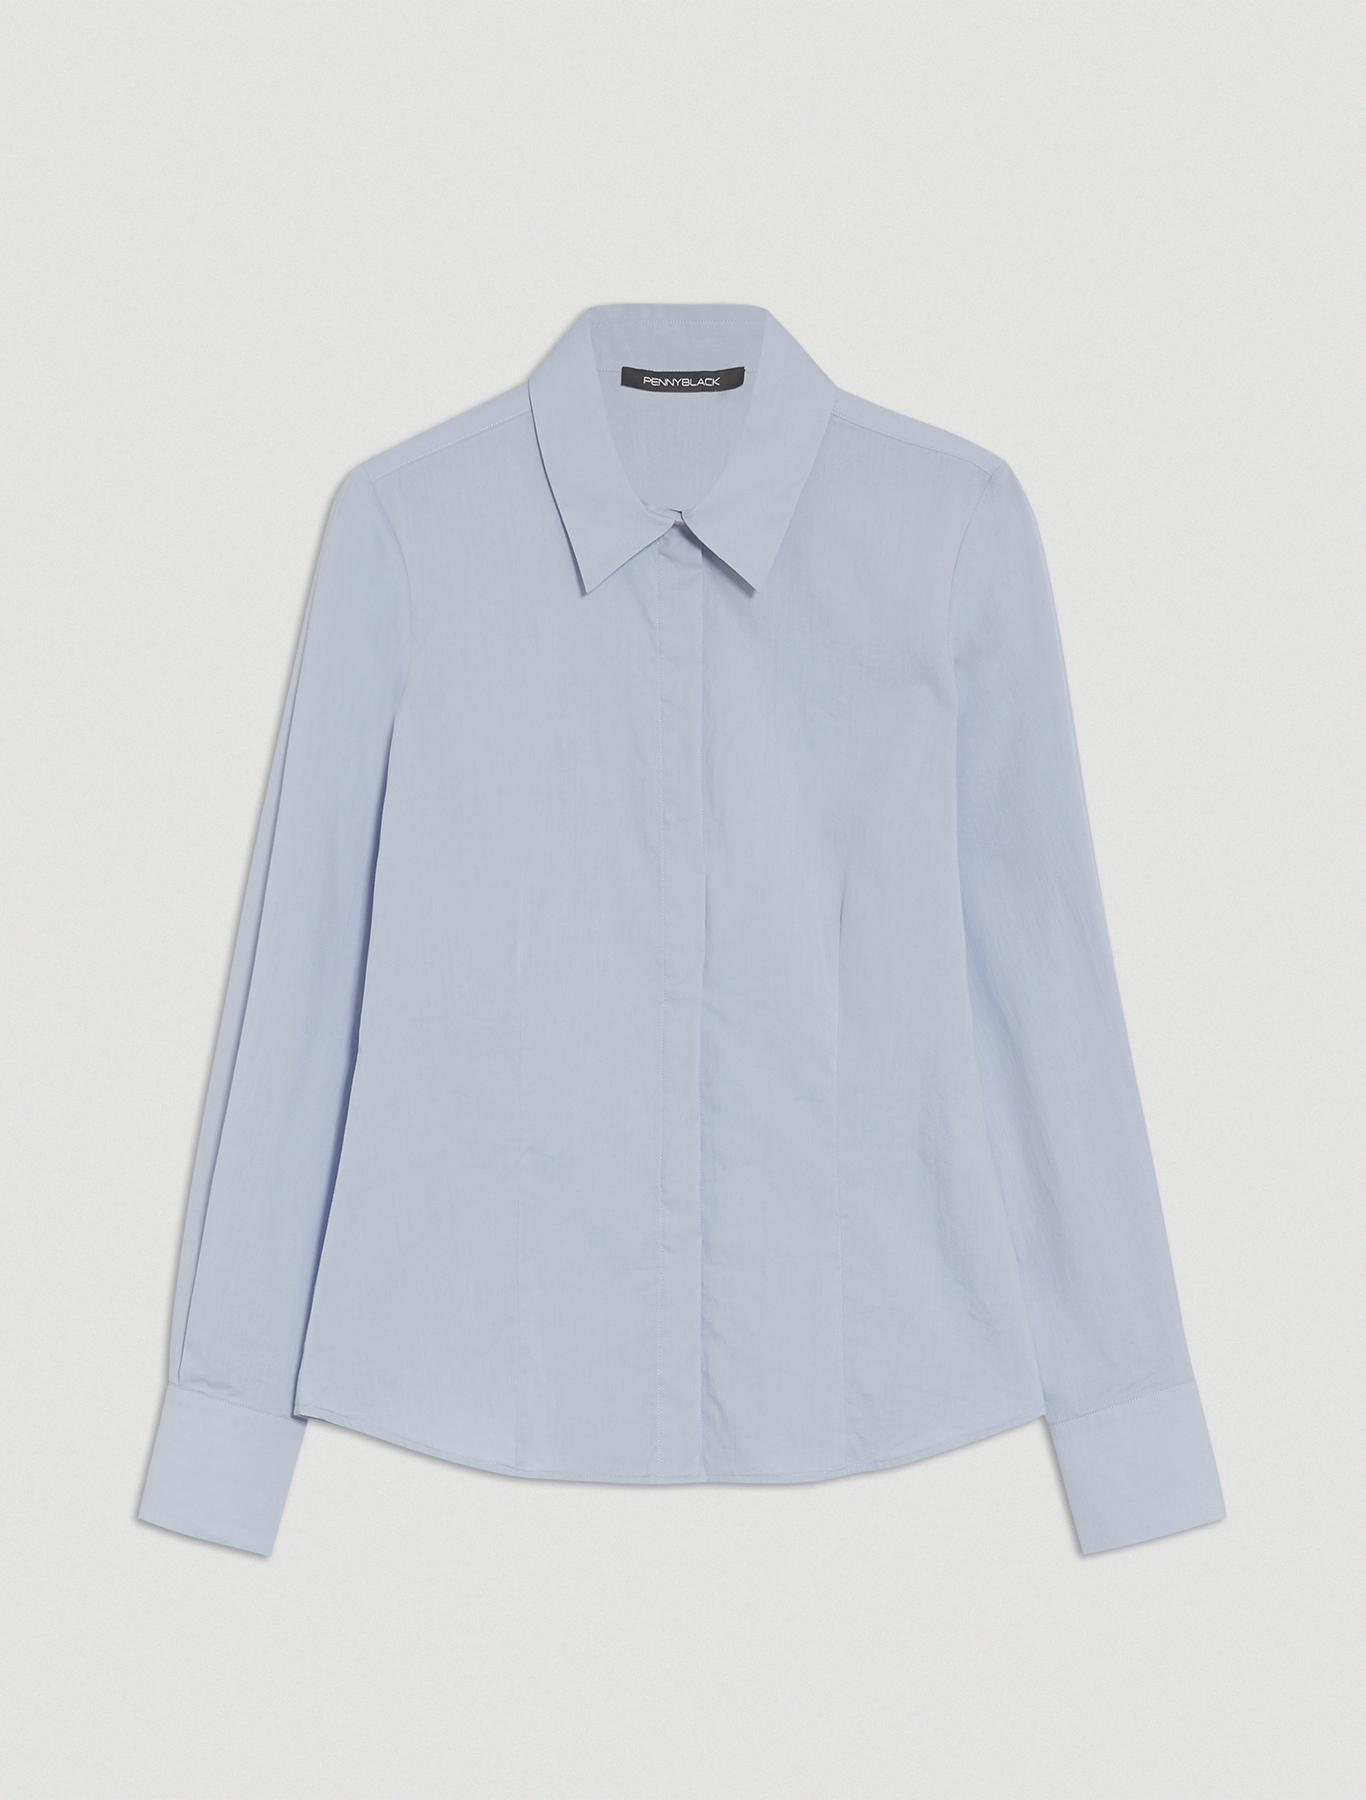 Slim poplin shirt - light blue - pennyblack